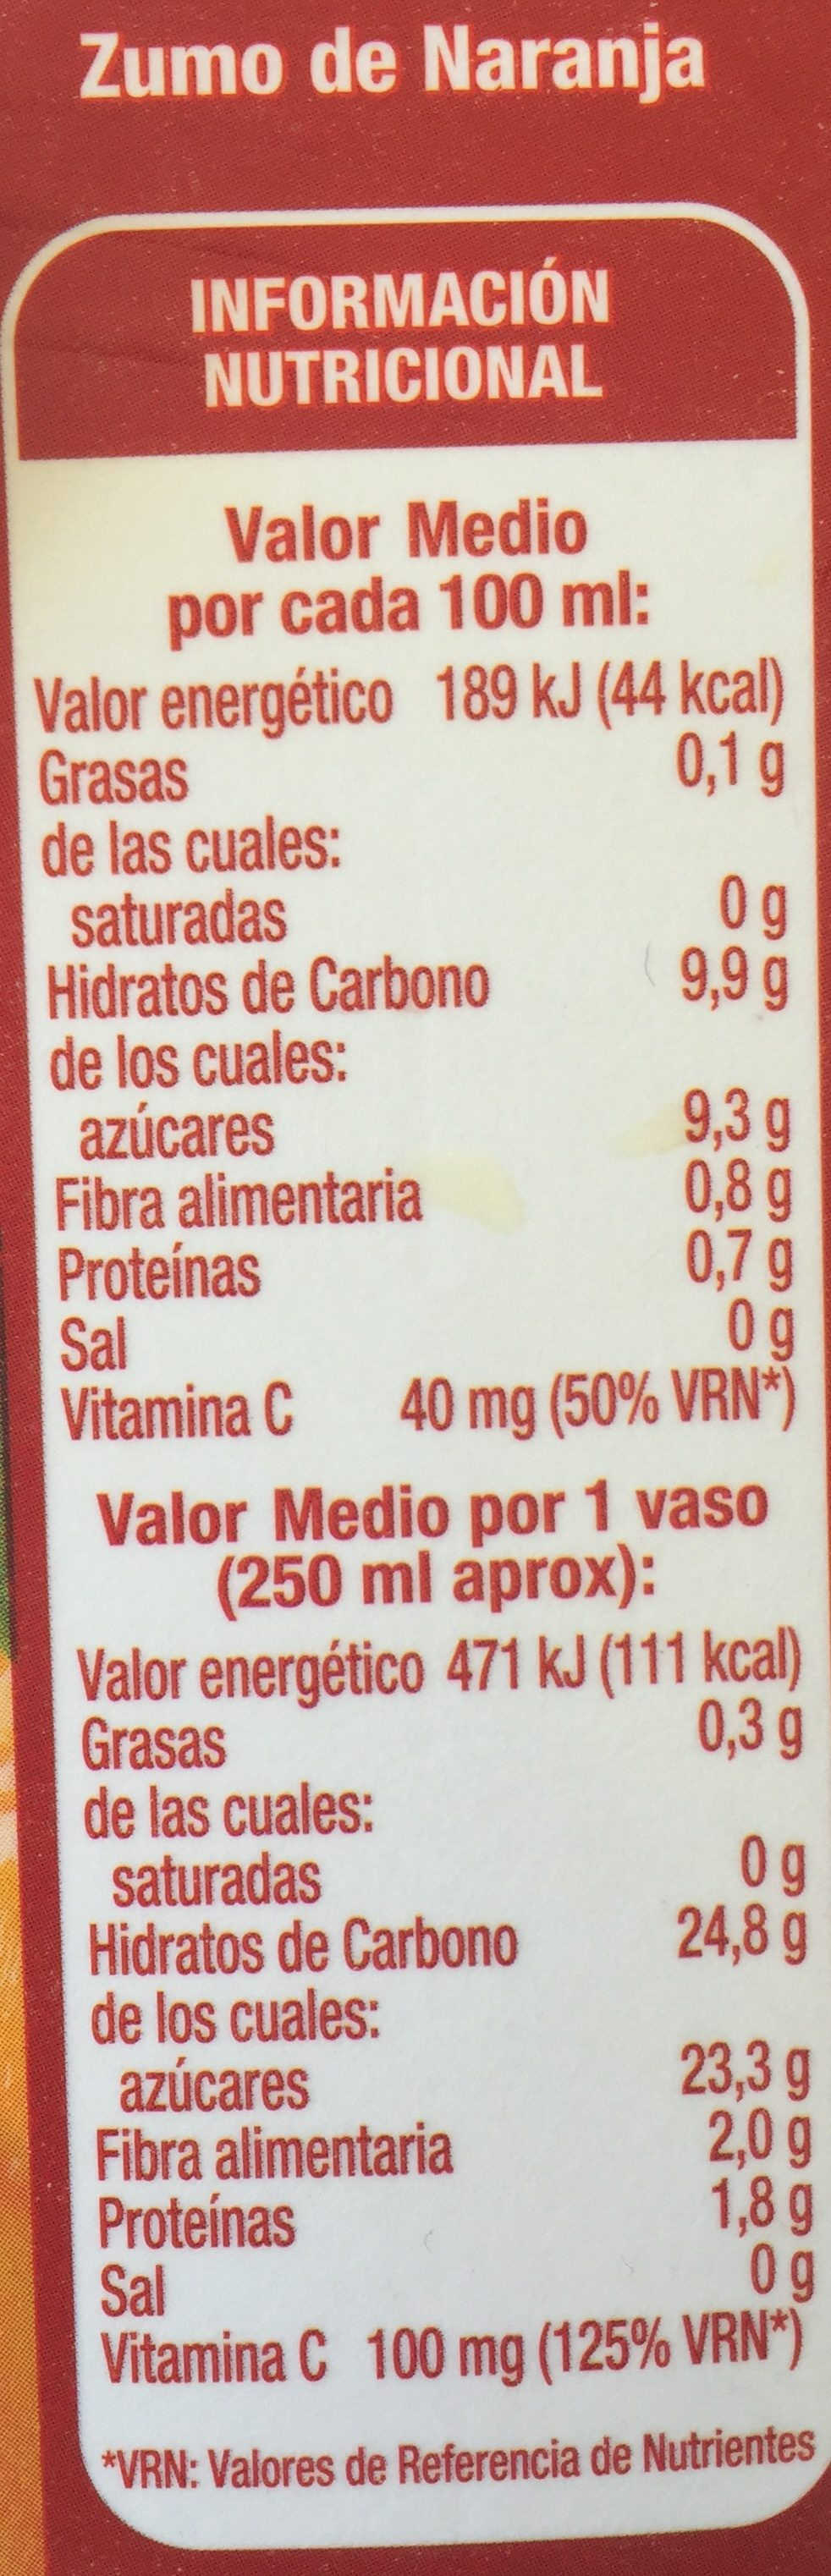 Zumo pura naranja con pulpa - Ingredientes